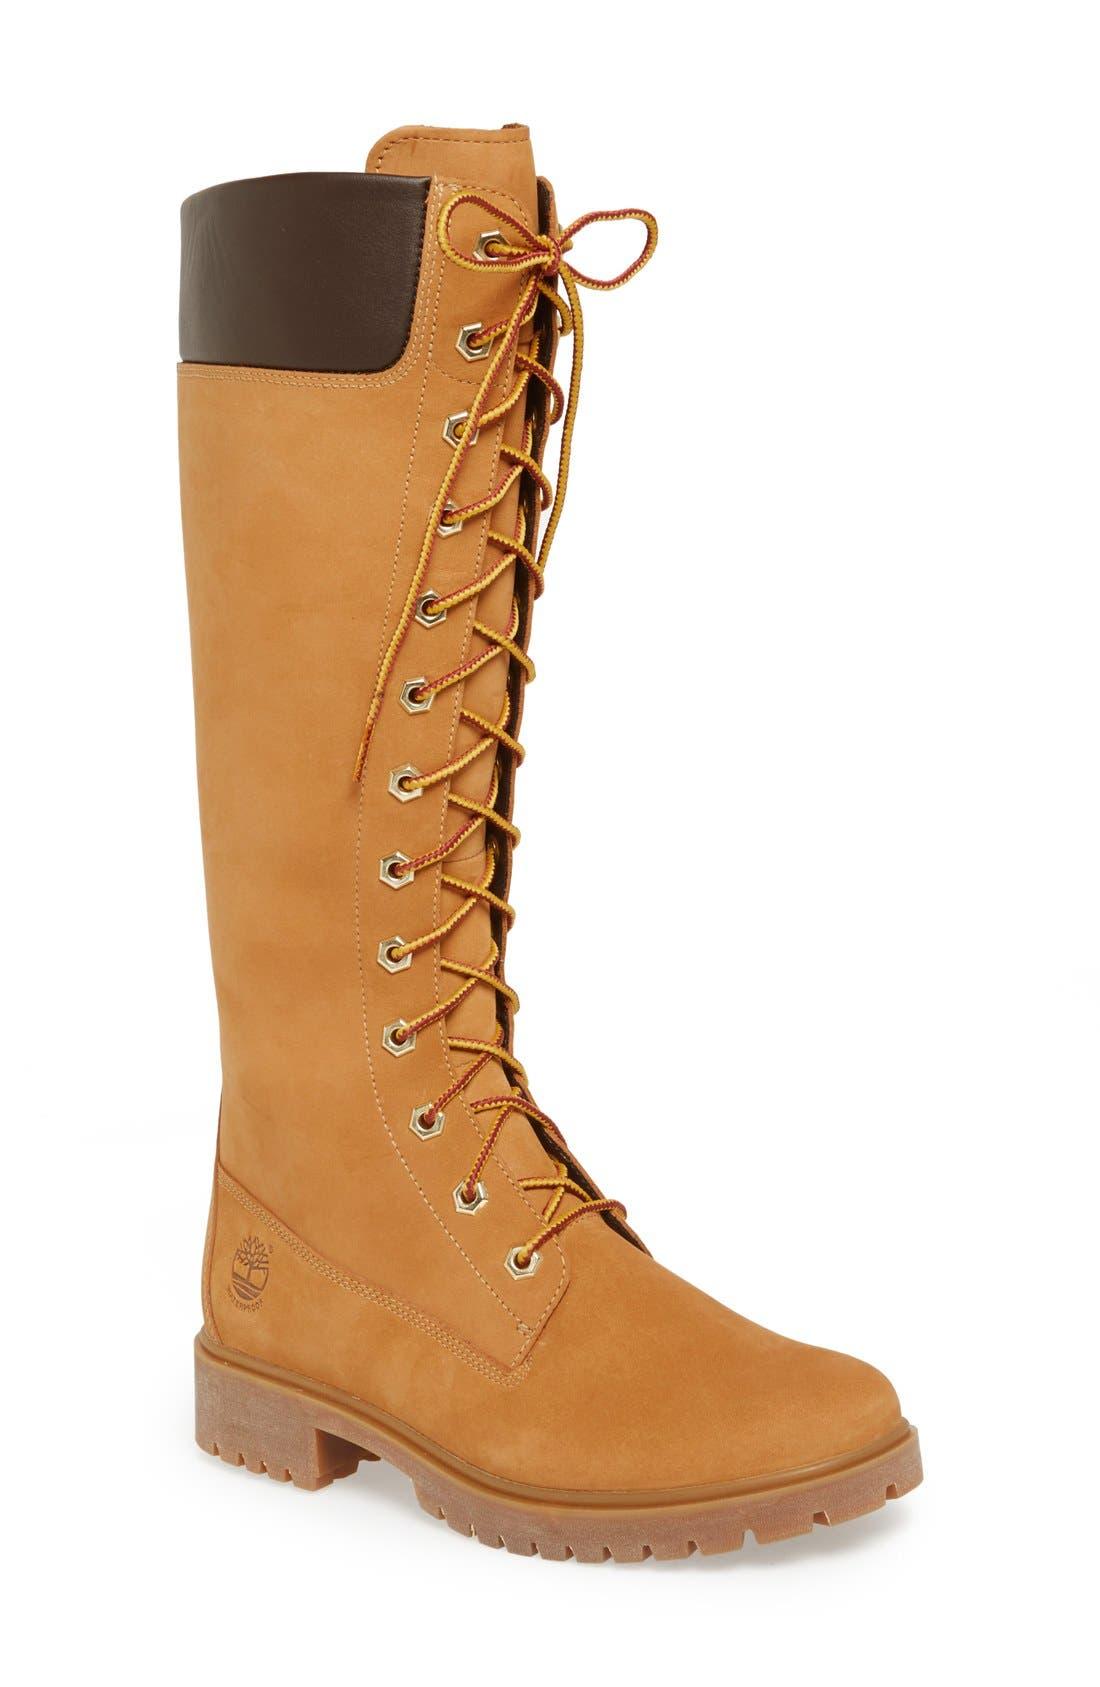 Main Image - Timberland Earthkeepers® Waterproof Tall Boot (Women)